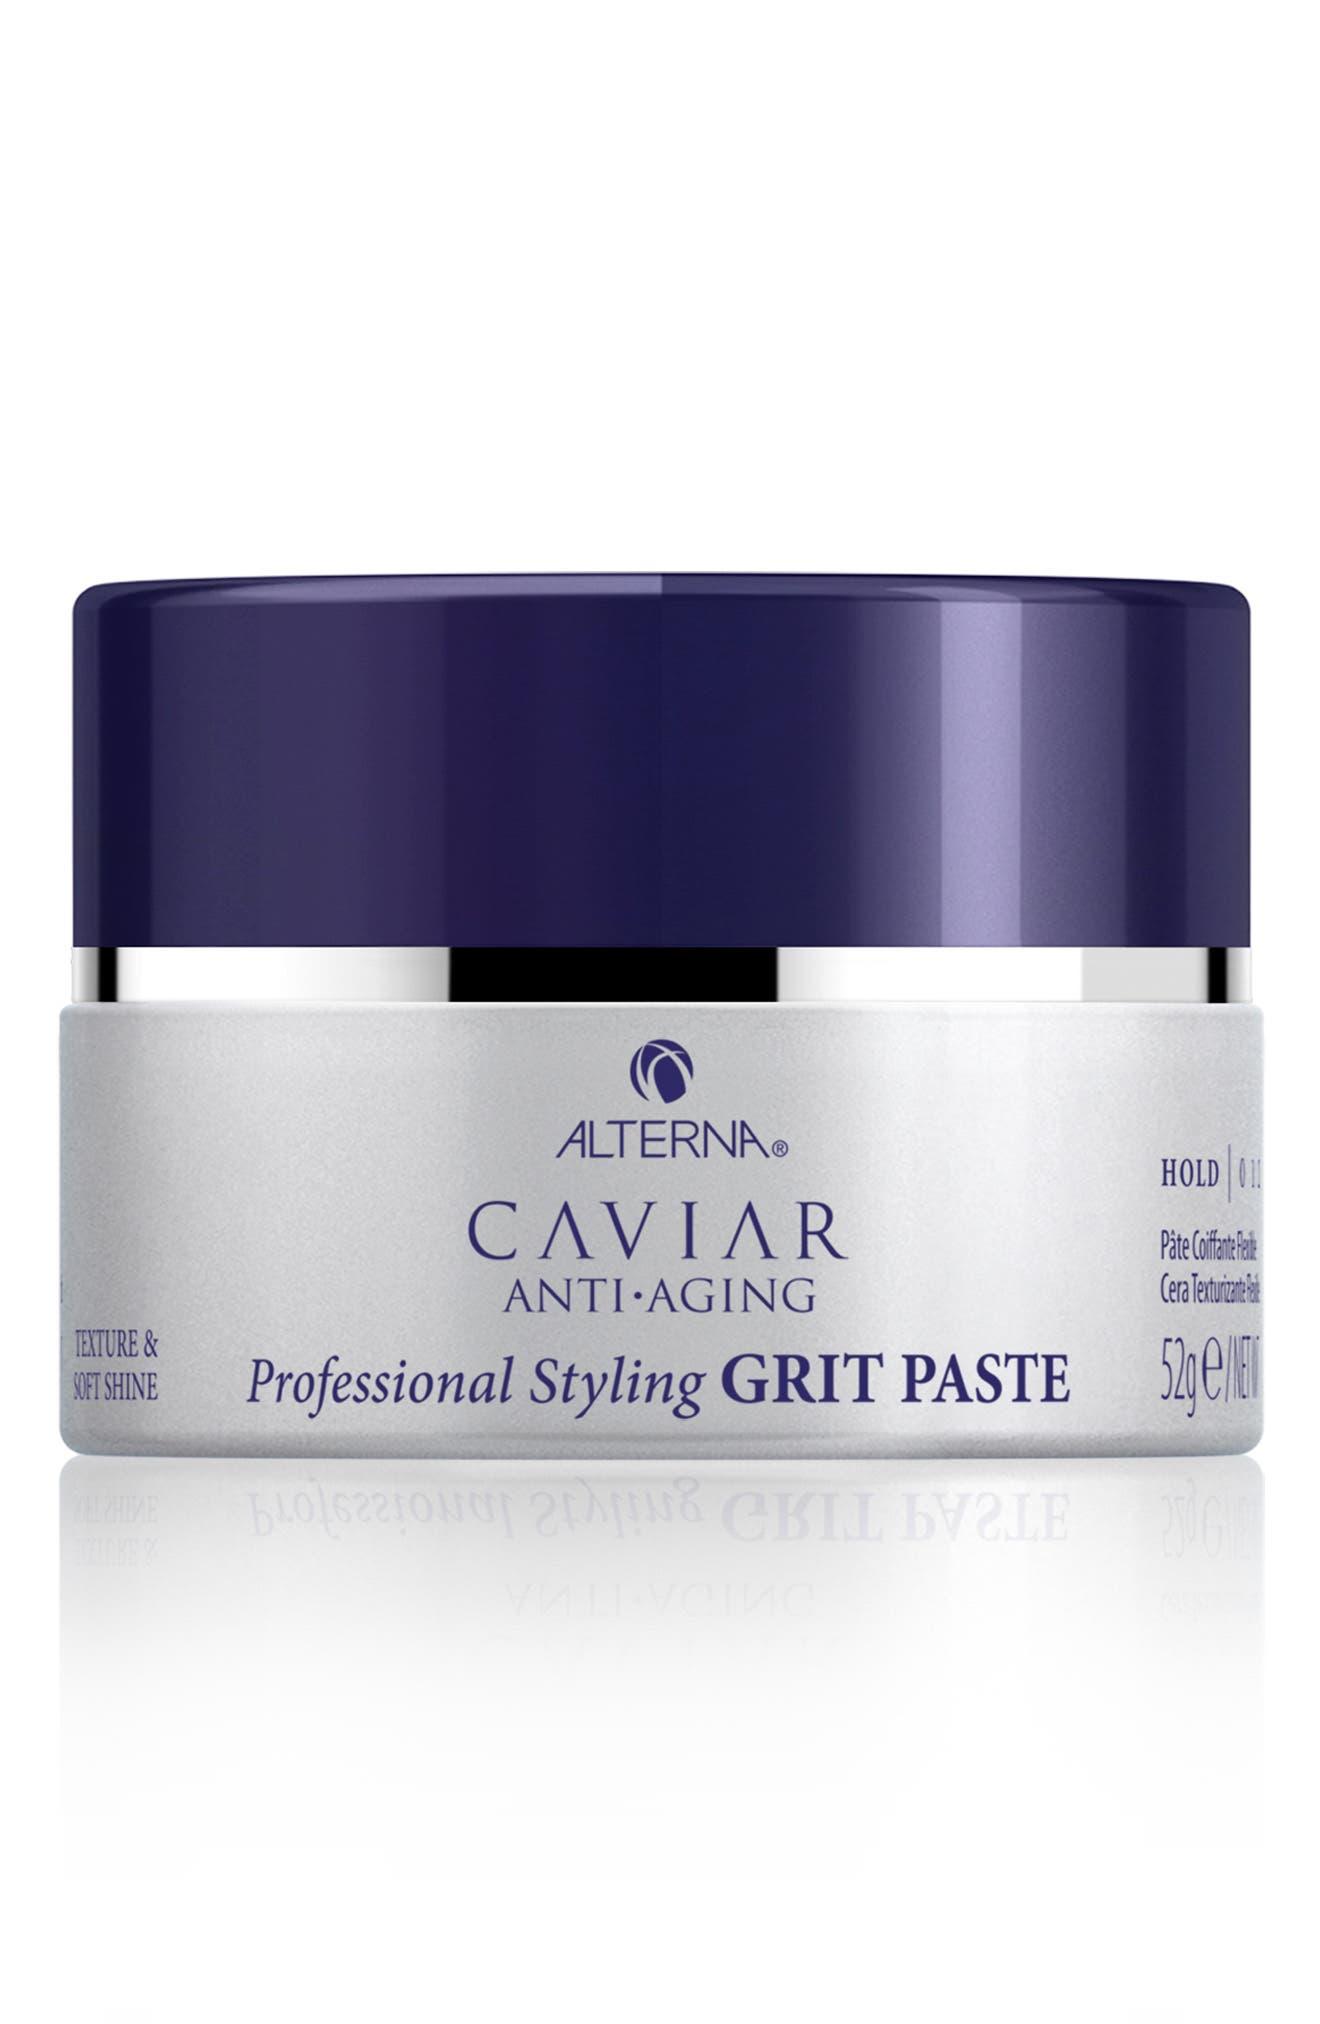 Alterna Caviar Anti-Aging Professional Styling Grit Paste